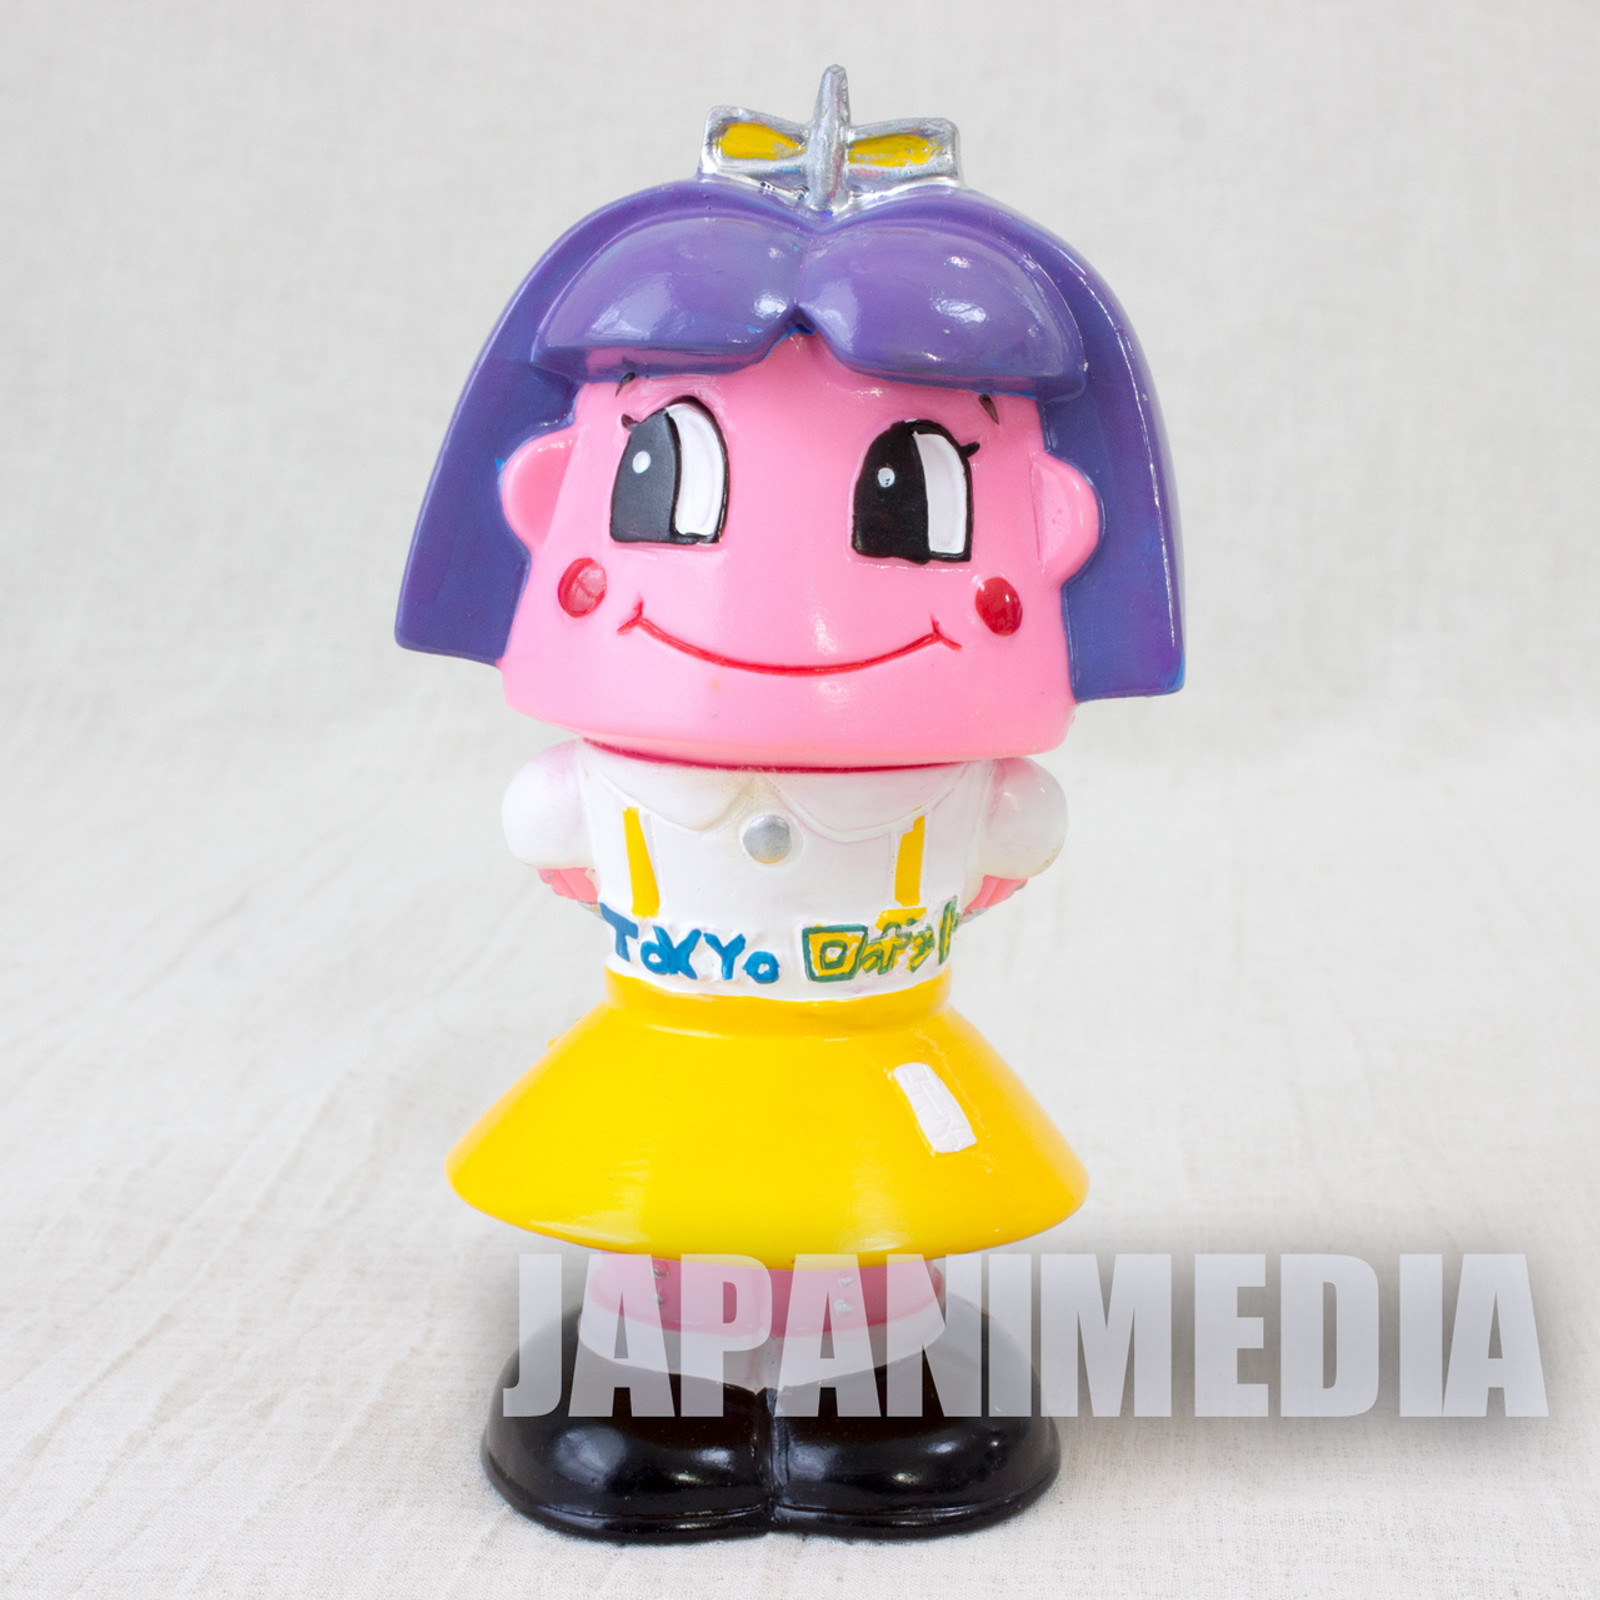 Retro RARE Girl Tokyo Robot 2nd Anniverary Soft Vinyl Figure 1996